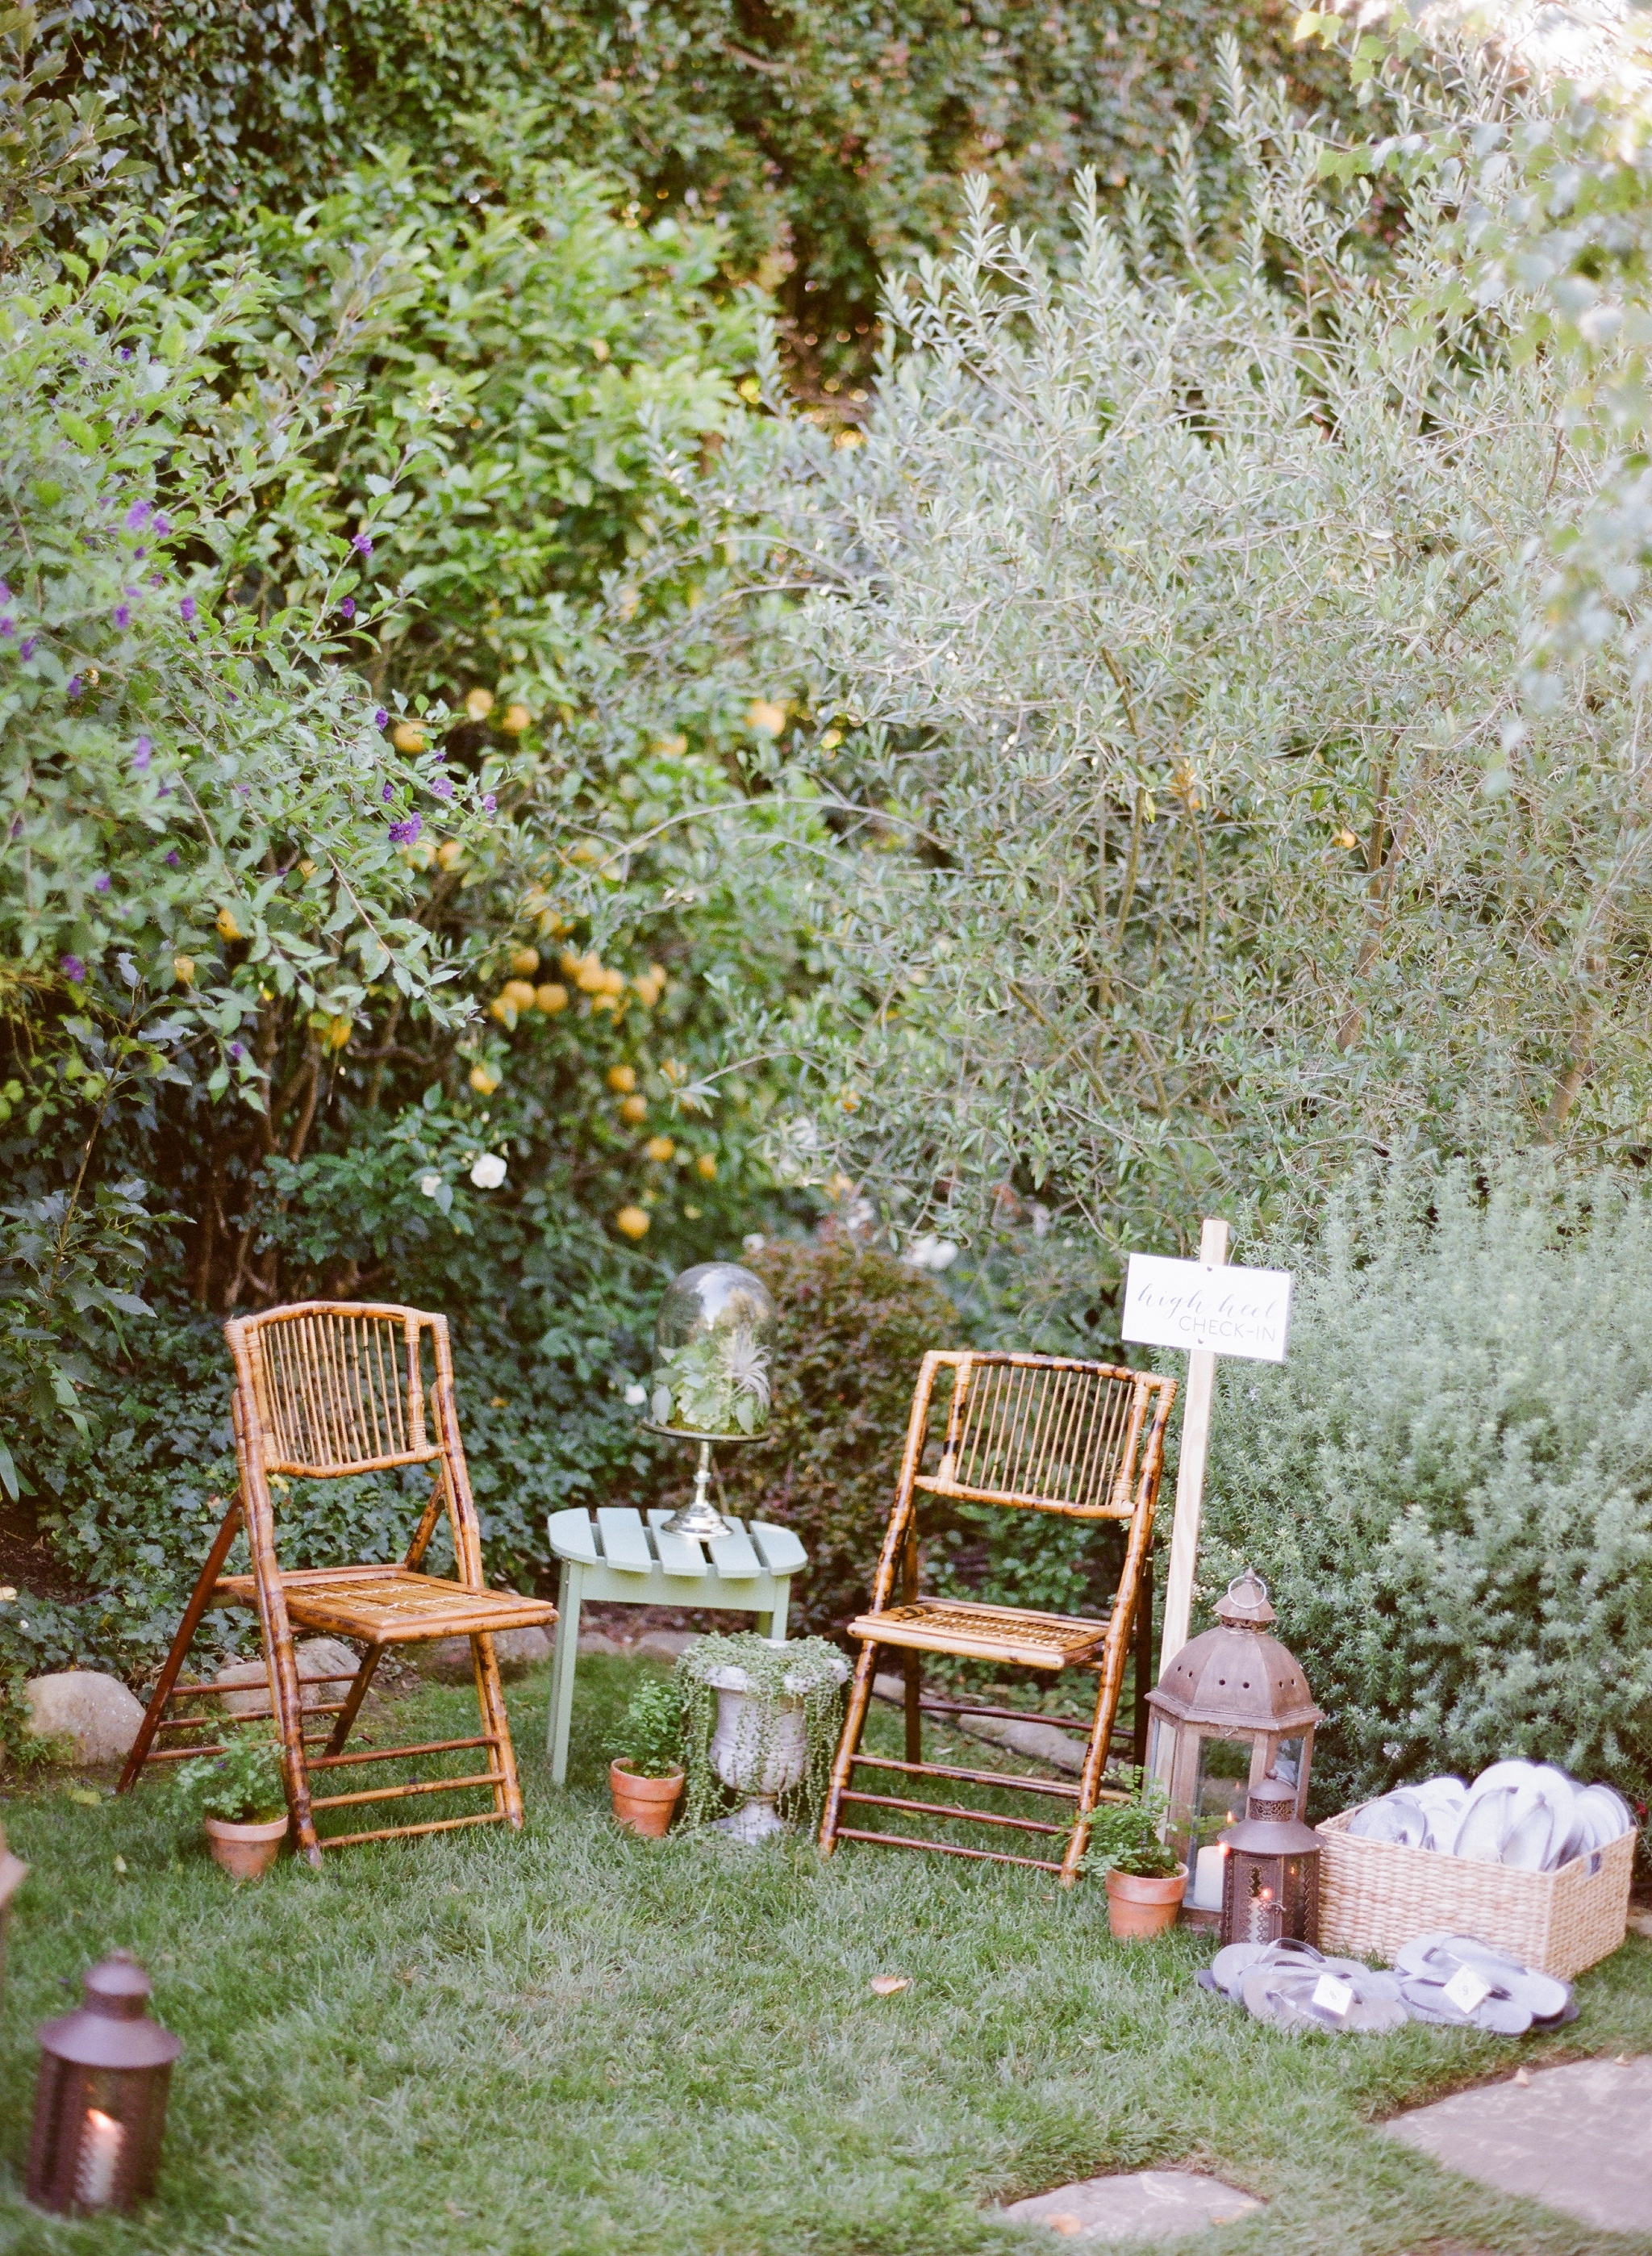 santabarbarawedding.com | Four Seasons Biltmore Wedding in Santa Barbara | Magnolia Event Design | Jose Villa